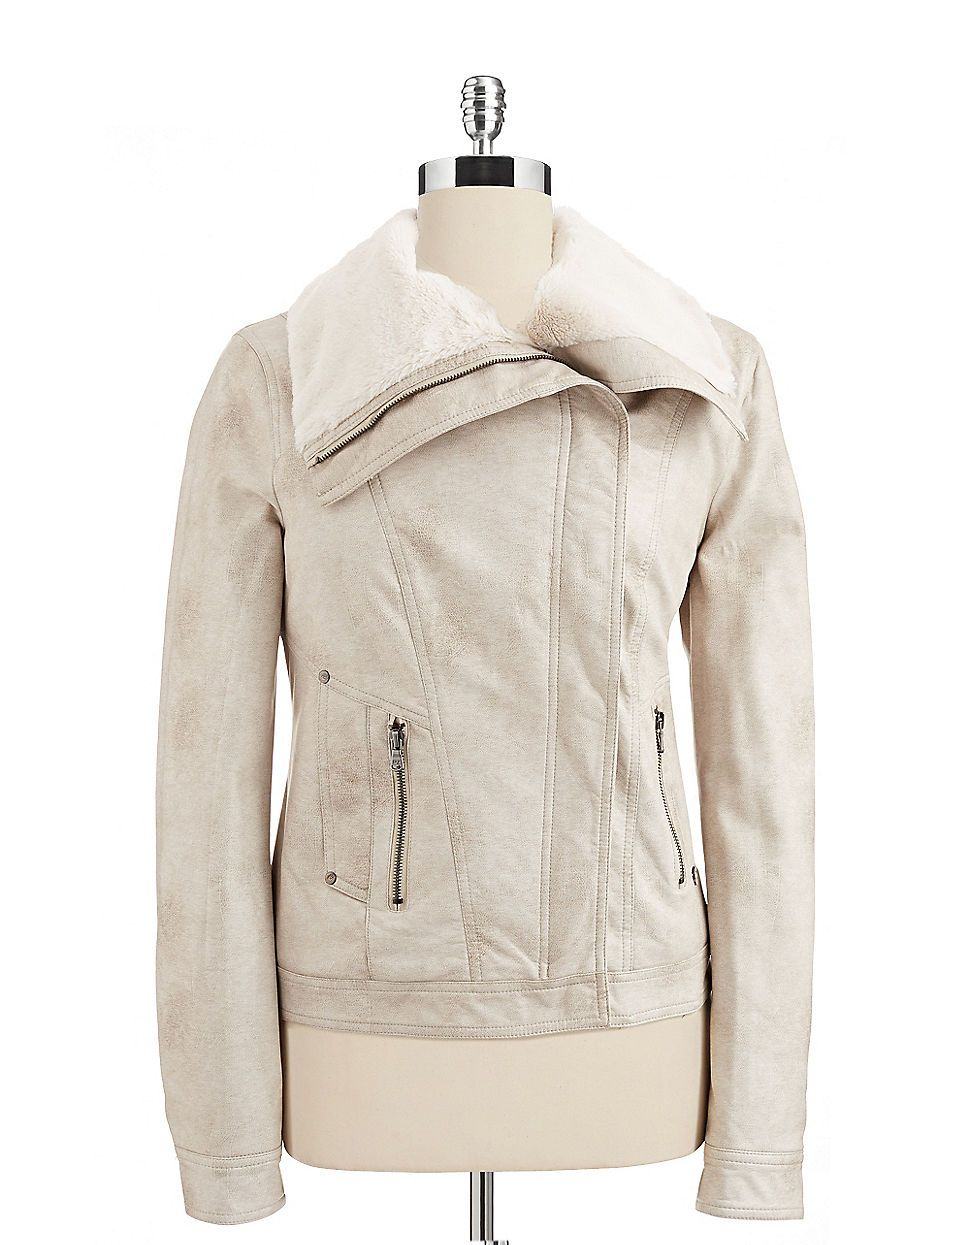 Envelope Bomber Jacket Hudson S Bay Jackets Bomber Jacket Clothes For Women [ 1245 x 970 Pixel ]